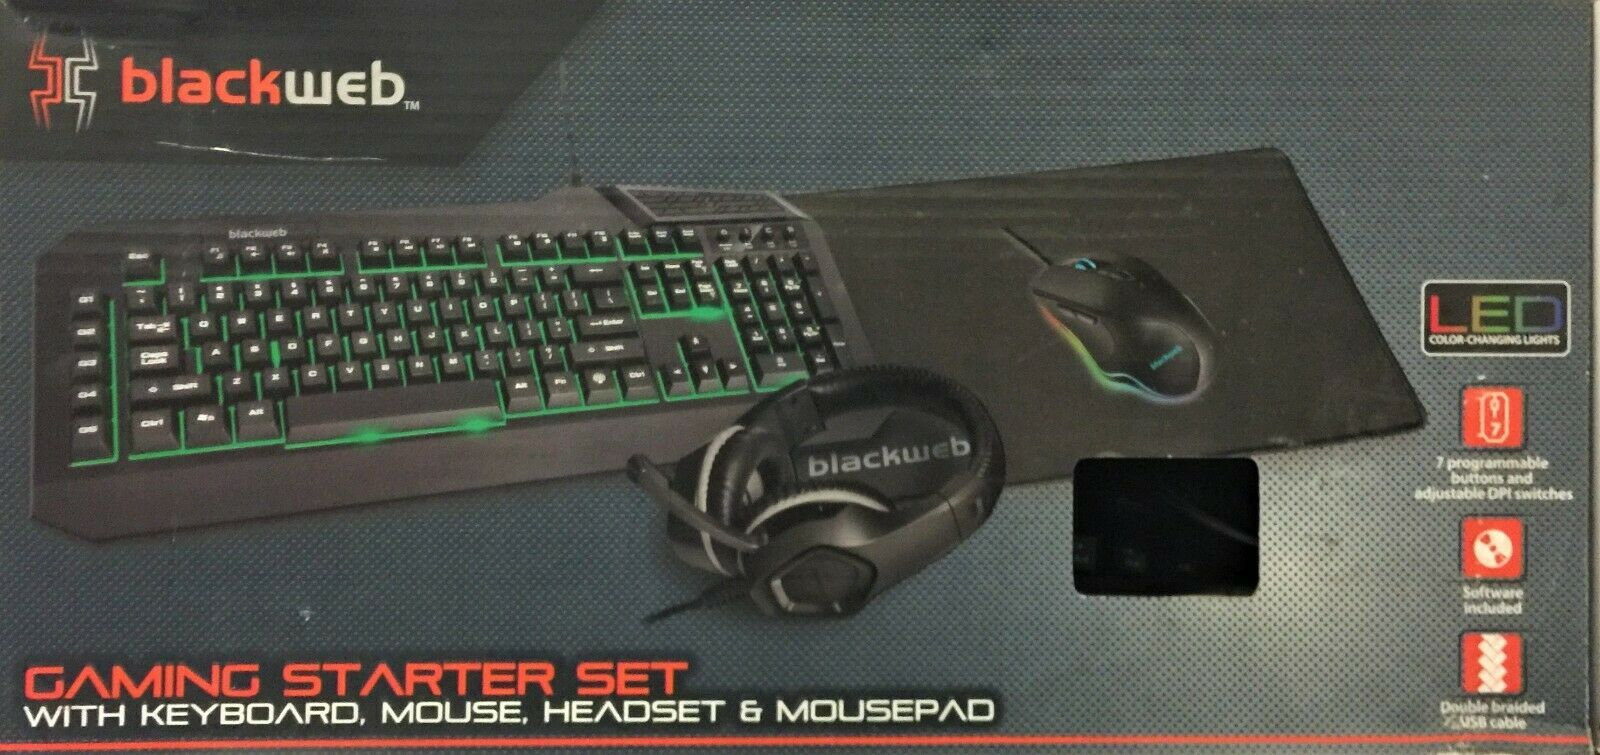 Blackweb Gaming Starter Kit with Keyboard, Mouse, Mousepad & Headset, BWA19H0004